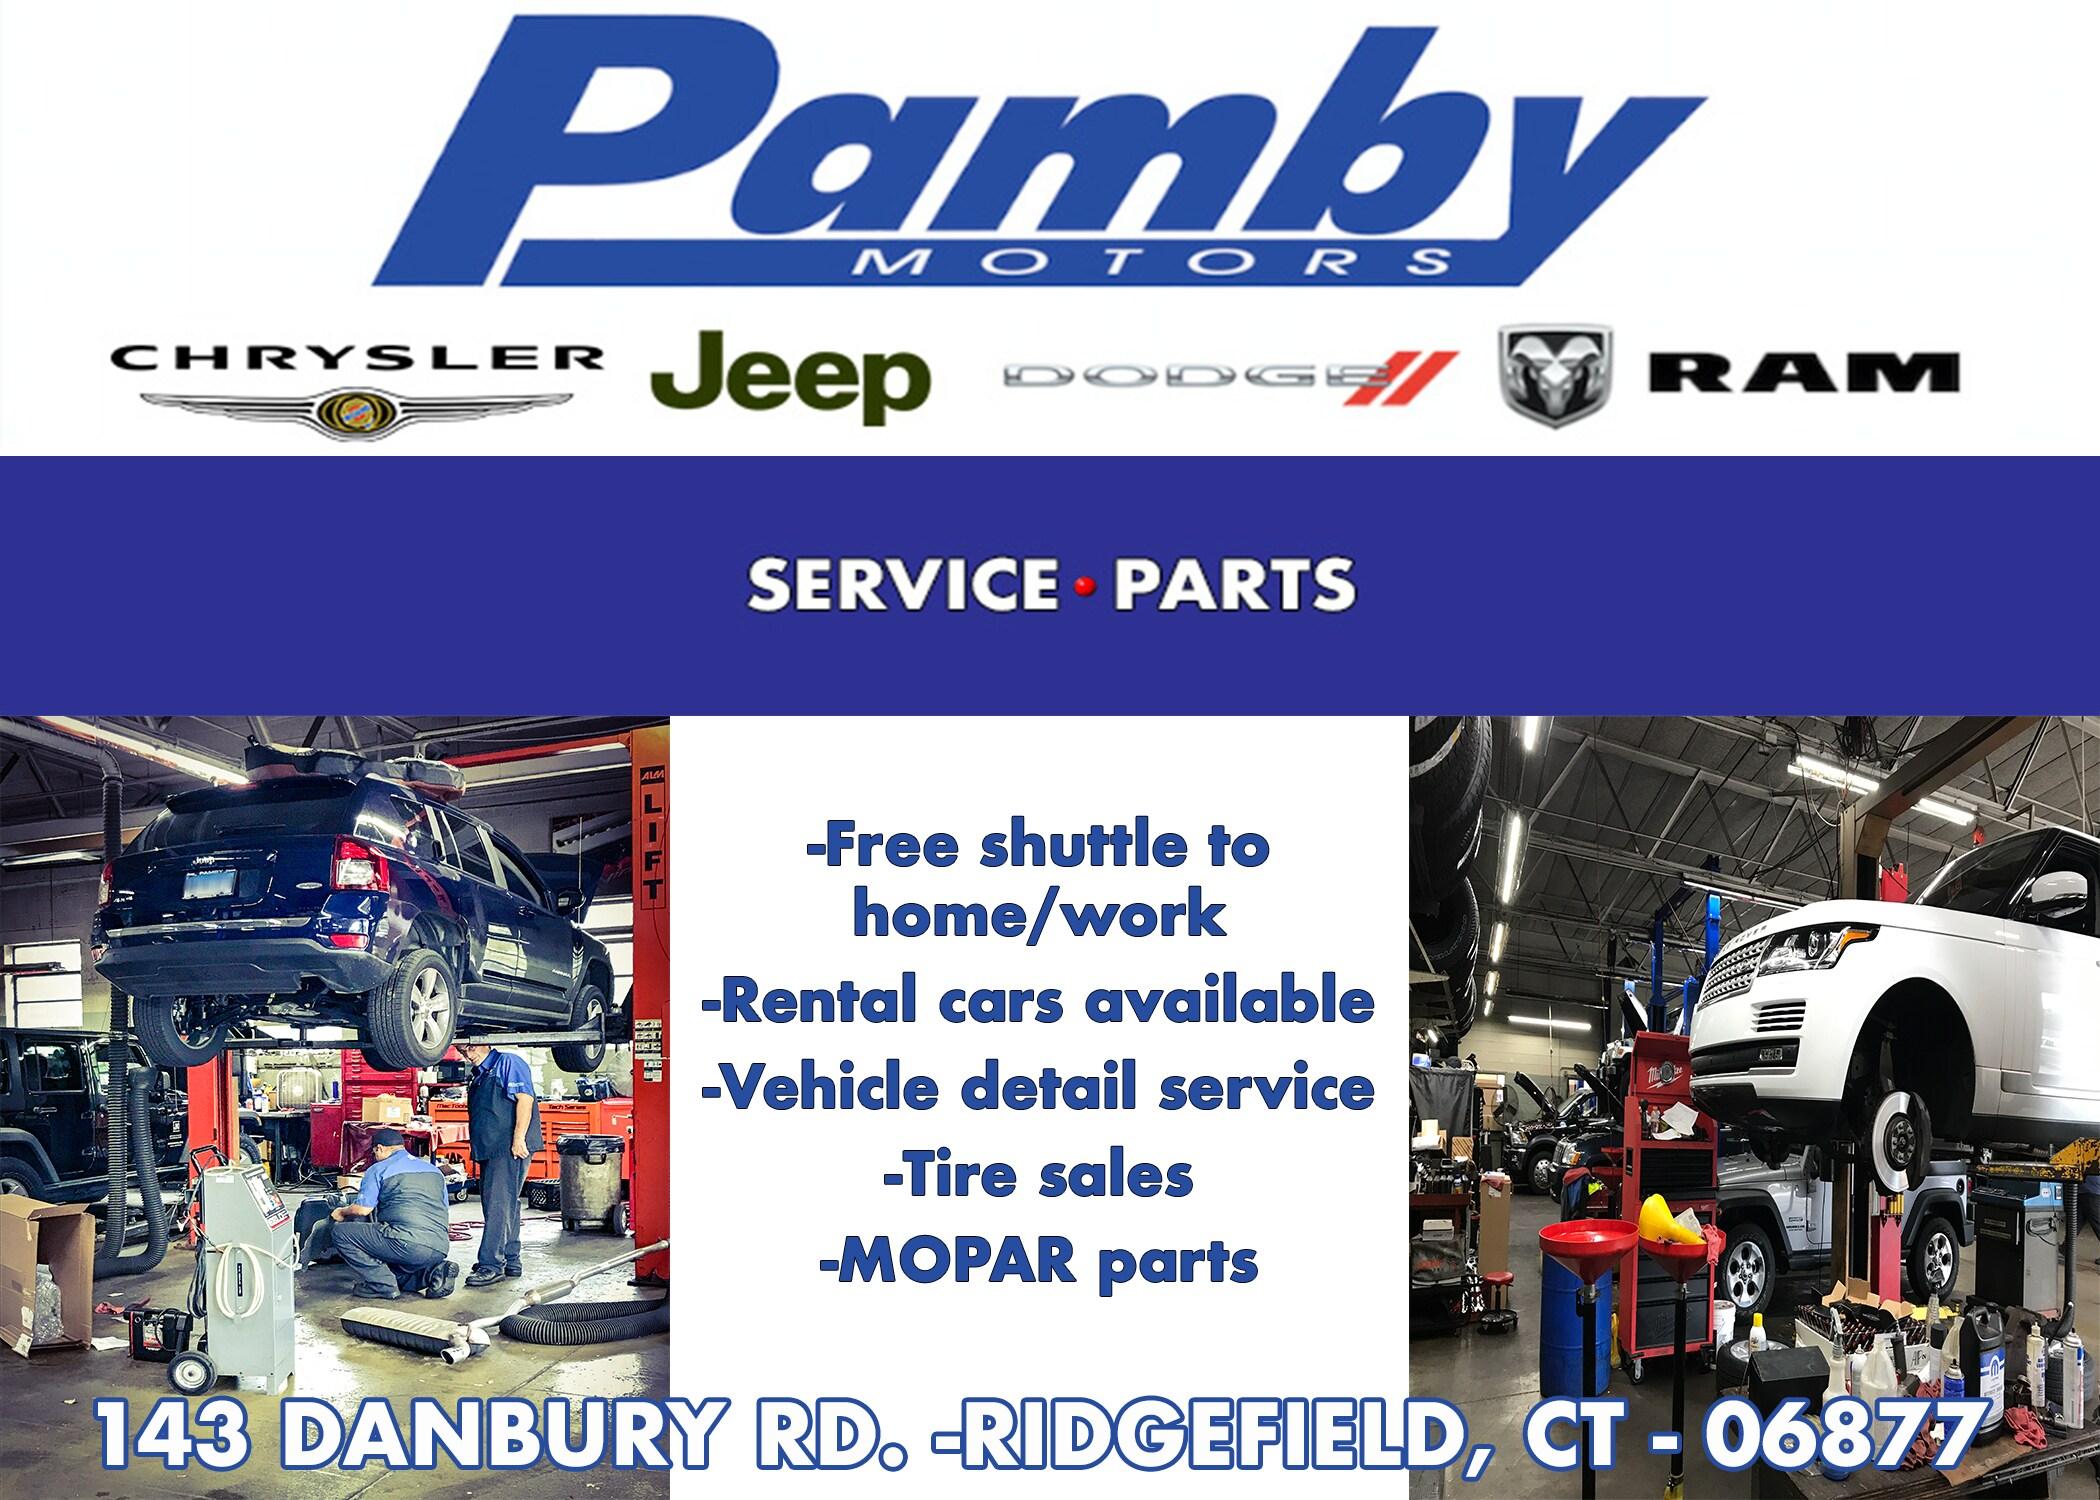 Pamby Motors New Used Car Dealer Ridgefield Ct